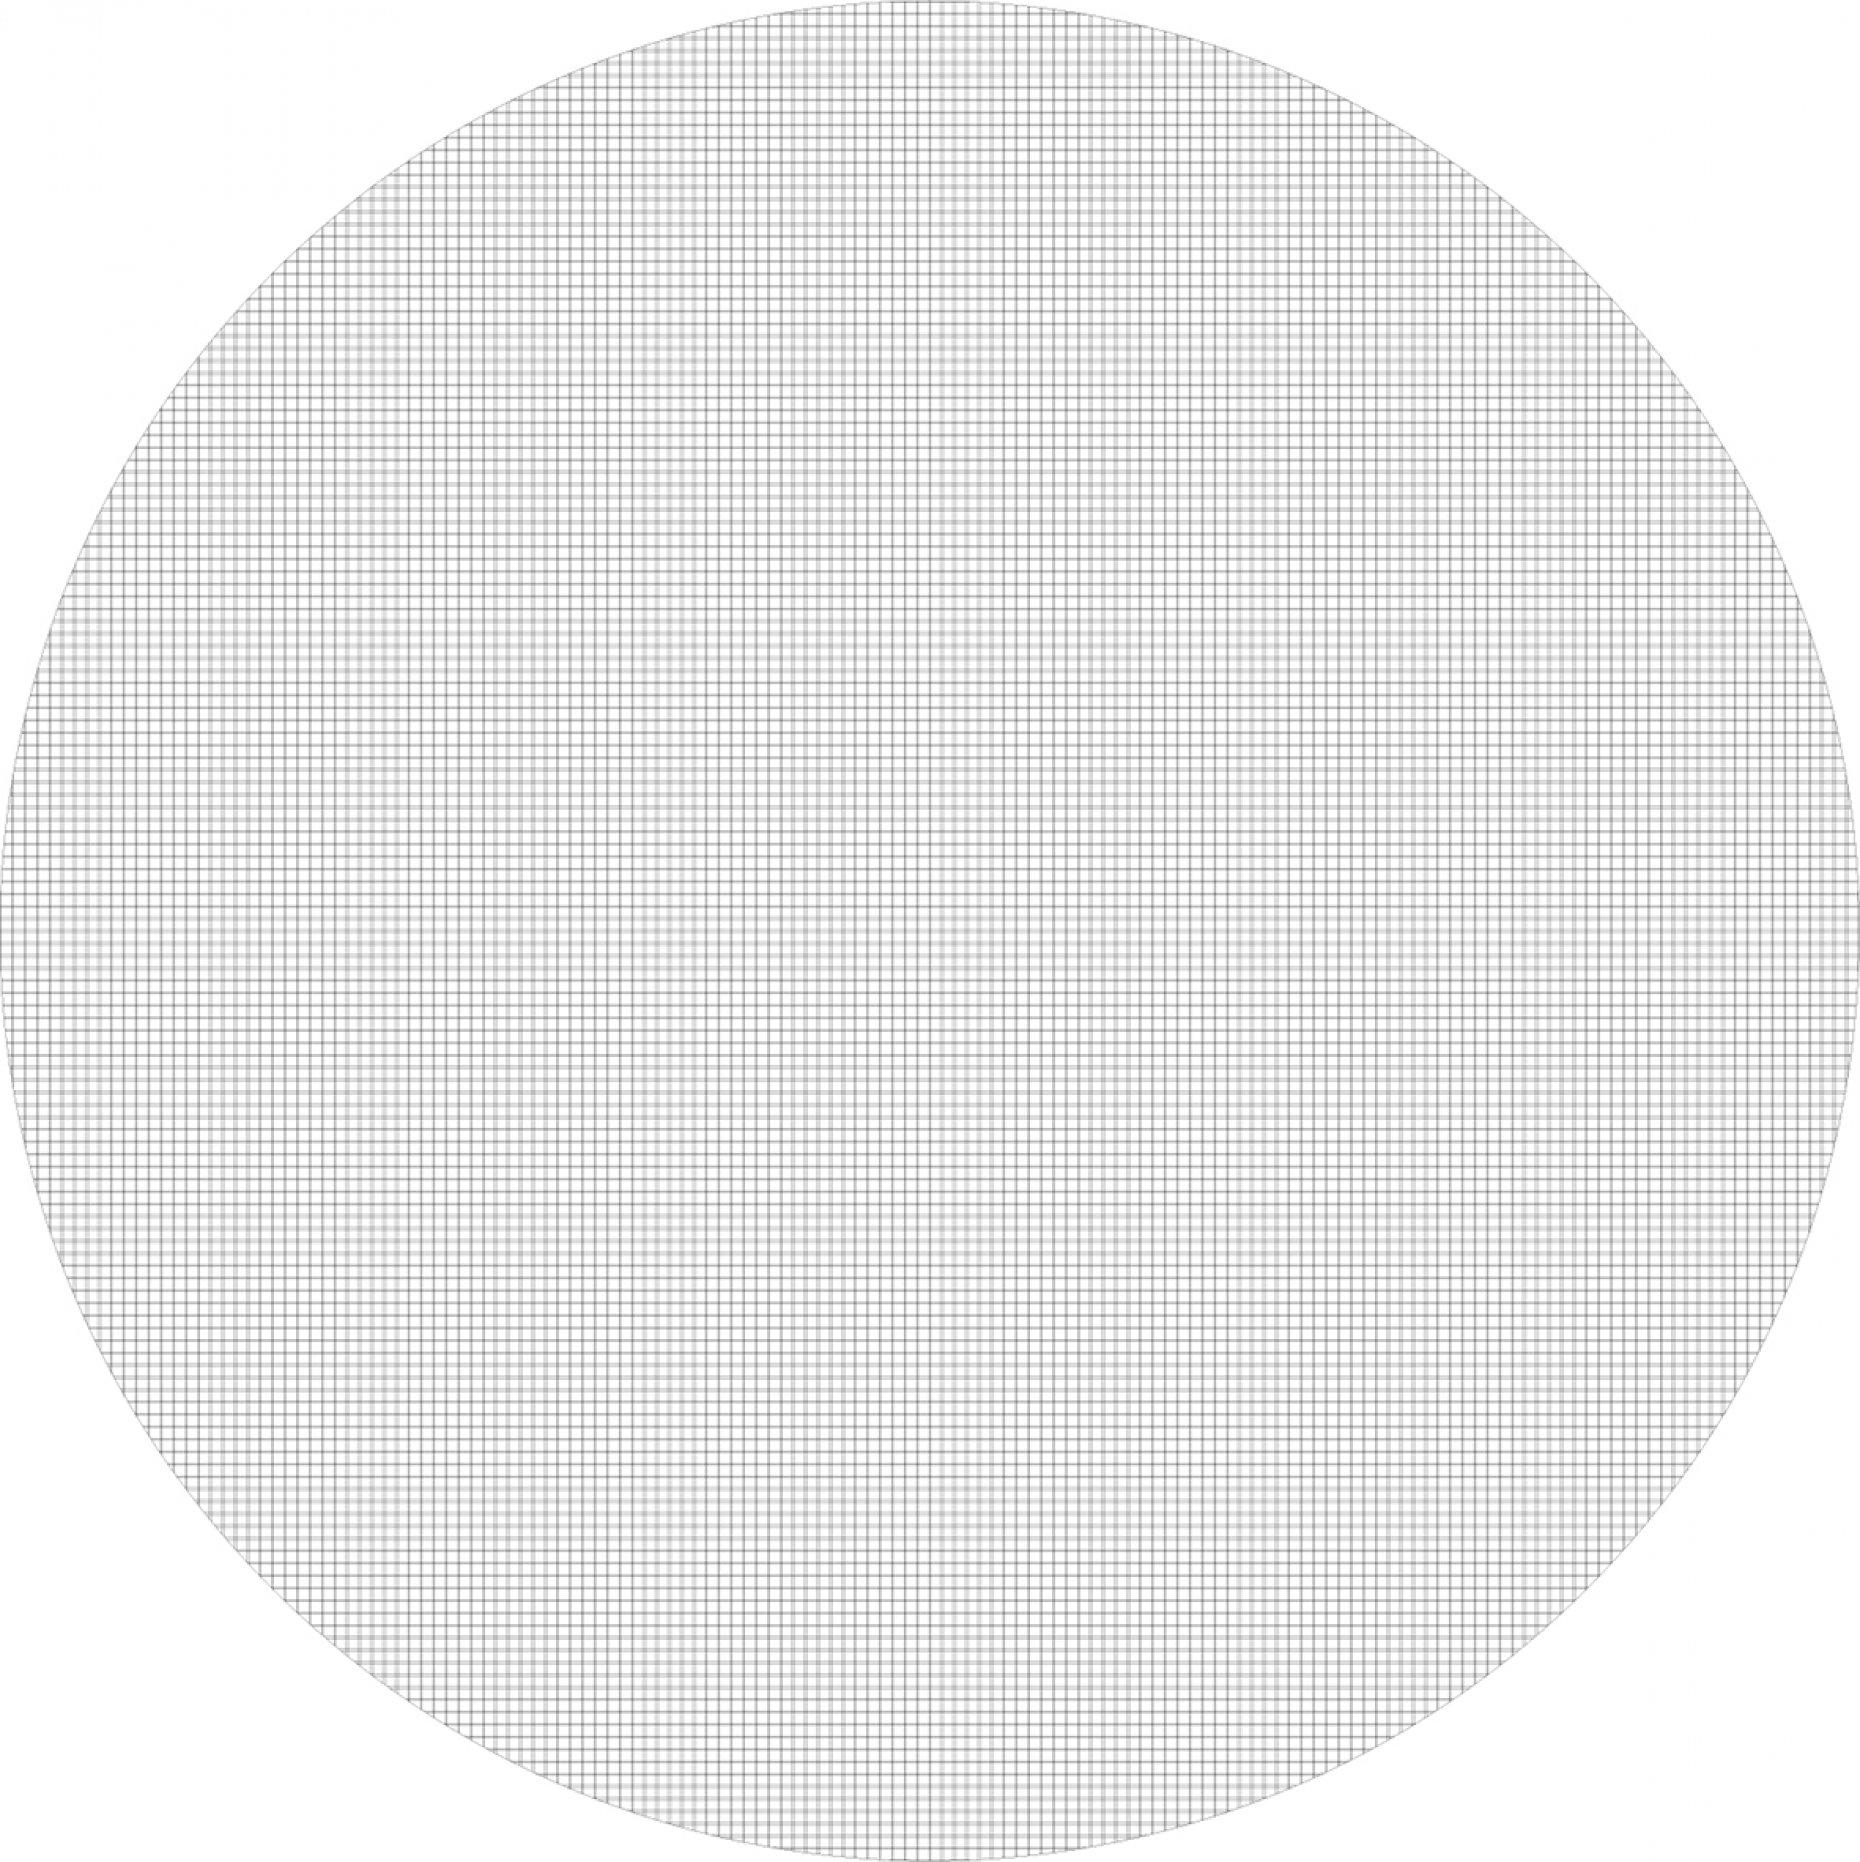 NE34 Net Grid 0.1mm Pitch Squares Pattern